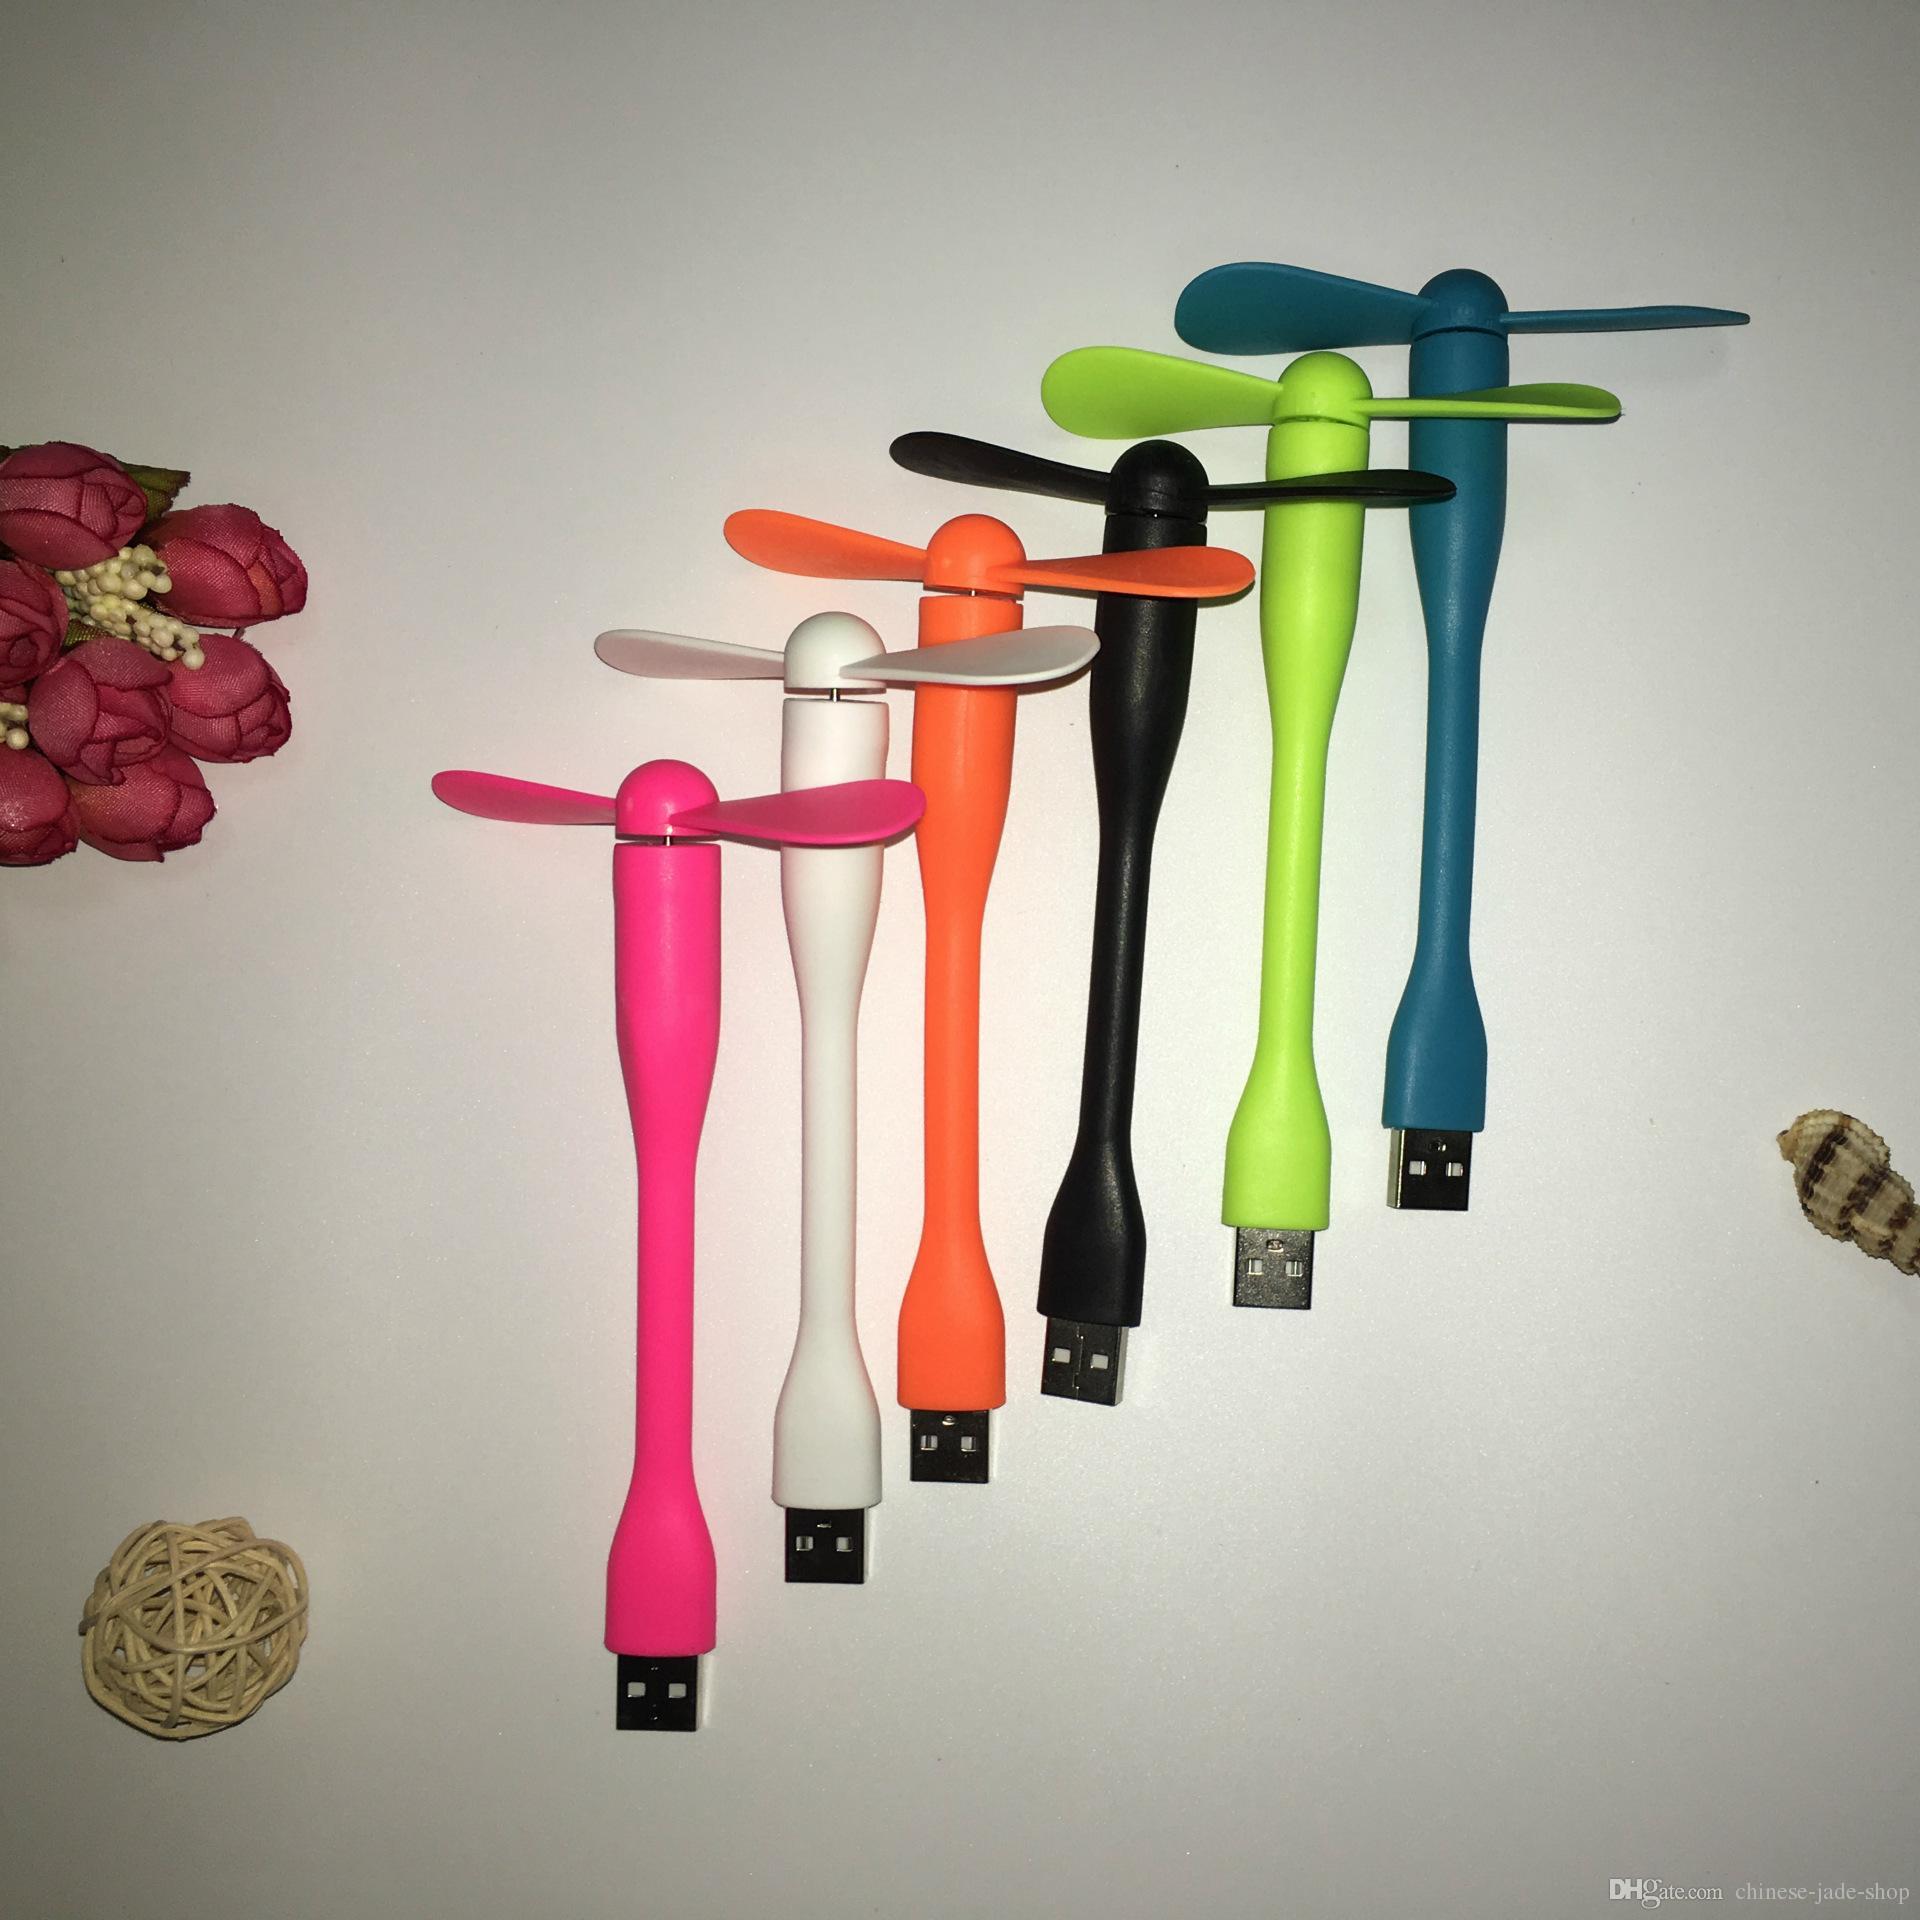 Tragbare TPE Mini-USB-Ventilator Smartphone-Power für Android Typ C 3 in 1 USB mit Paket /